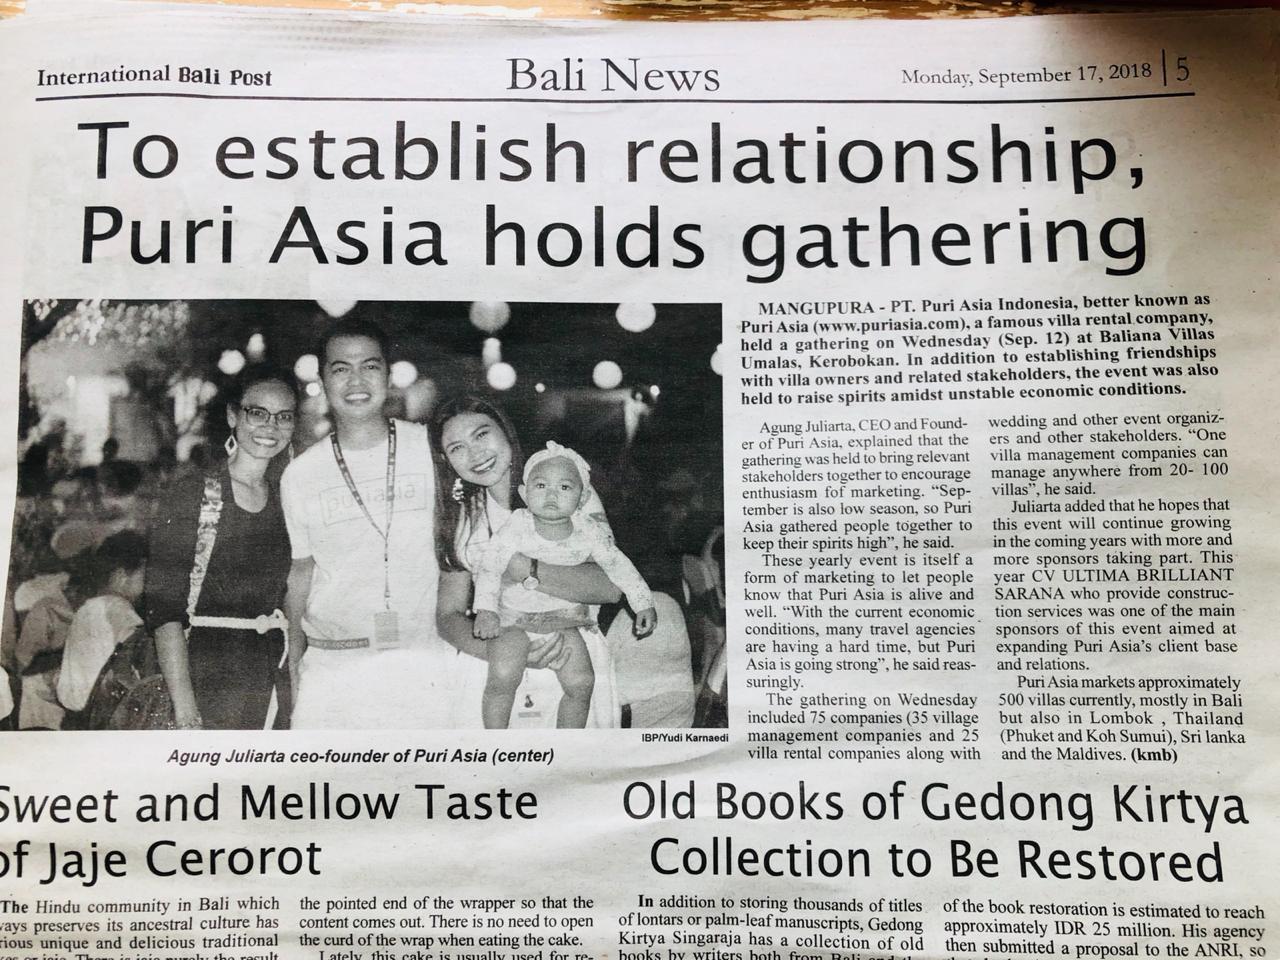 Puri asia gathering 2018